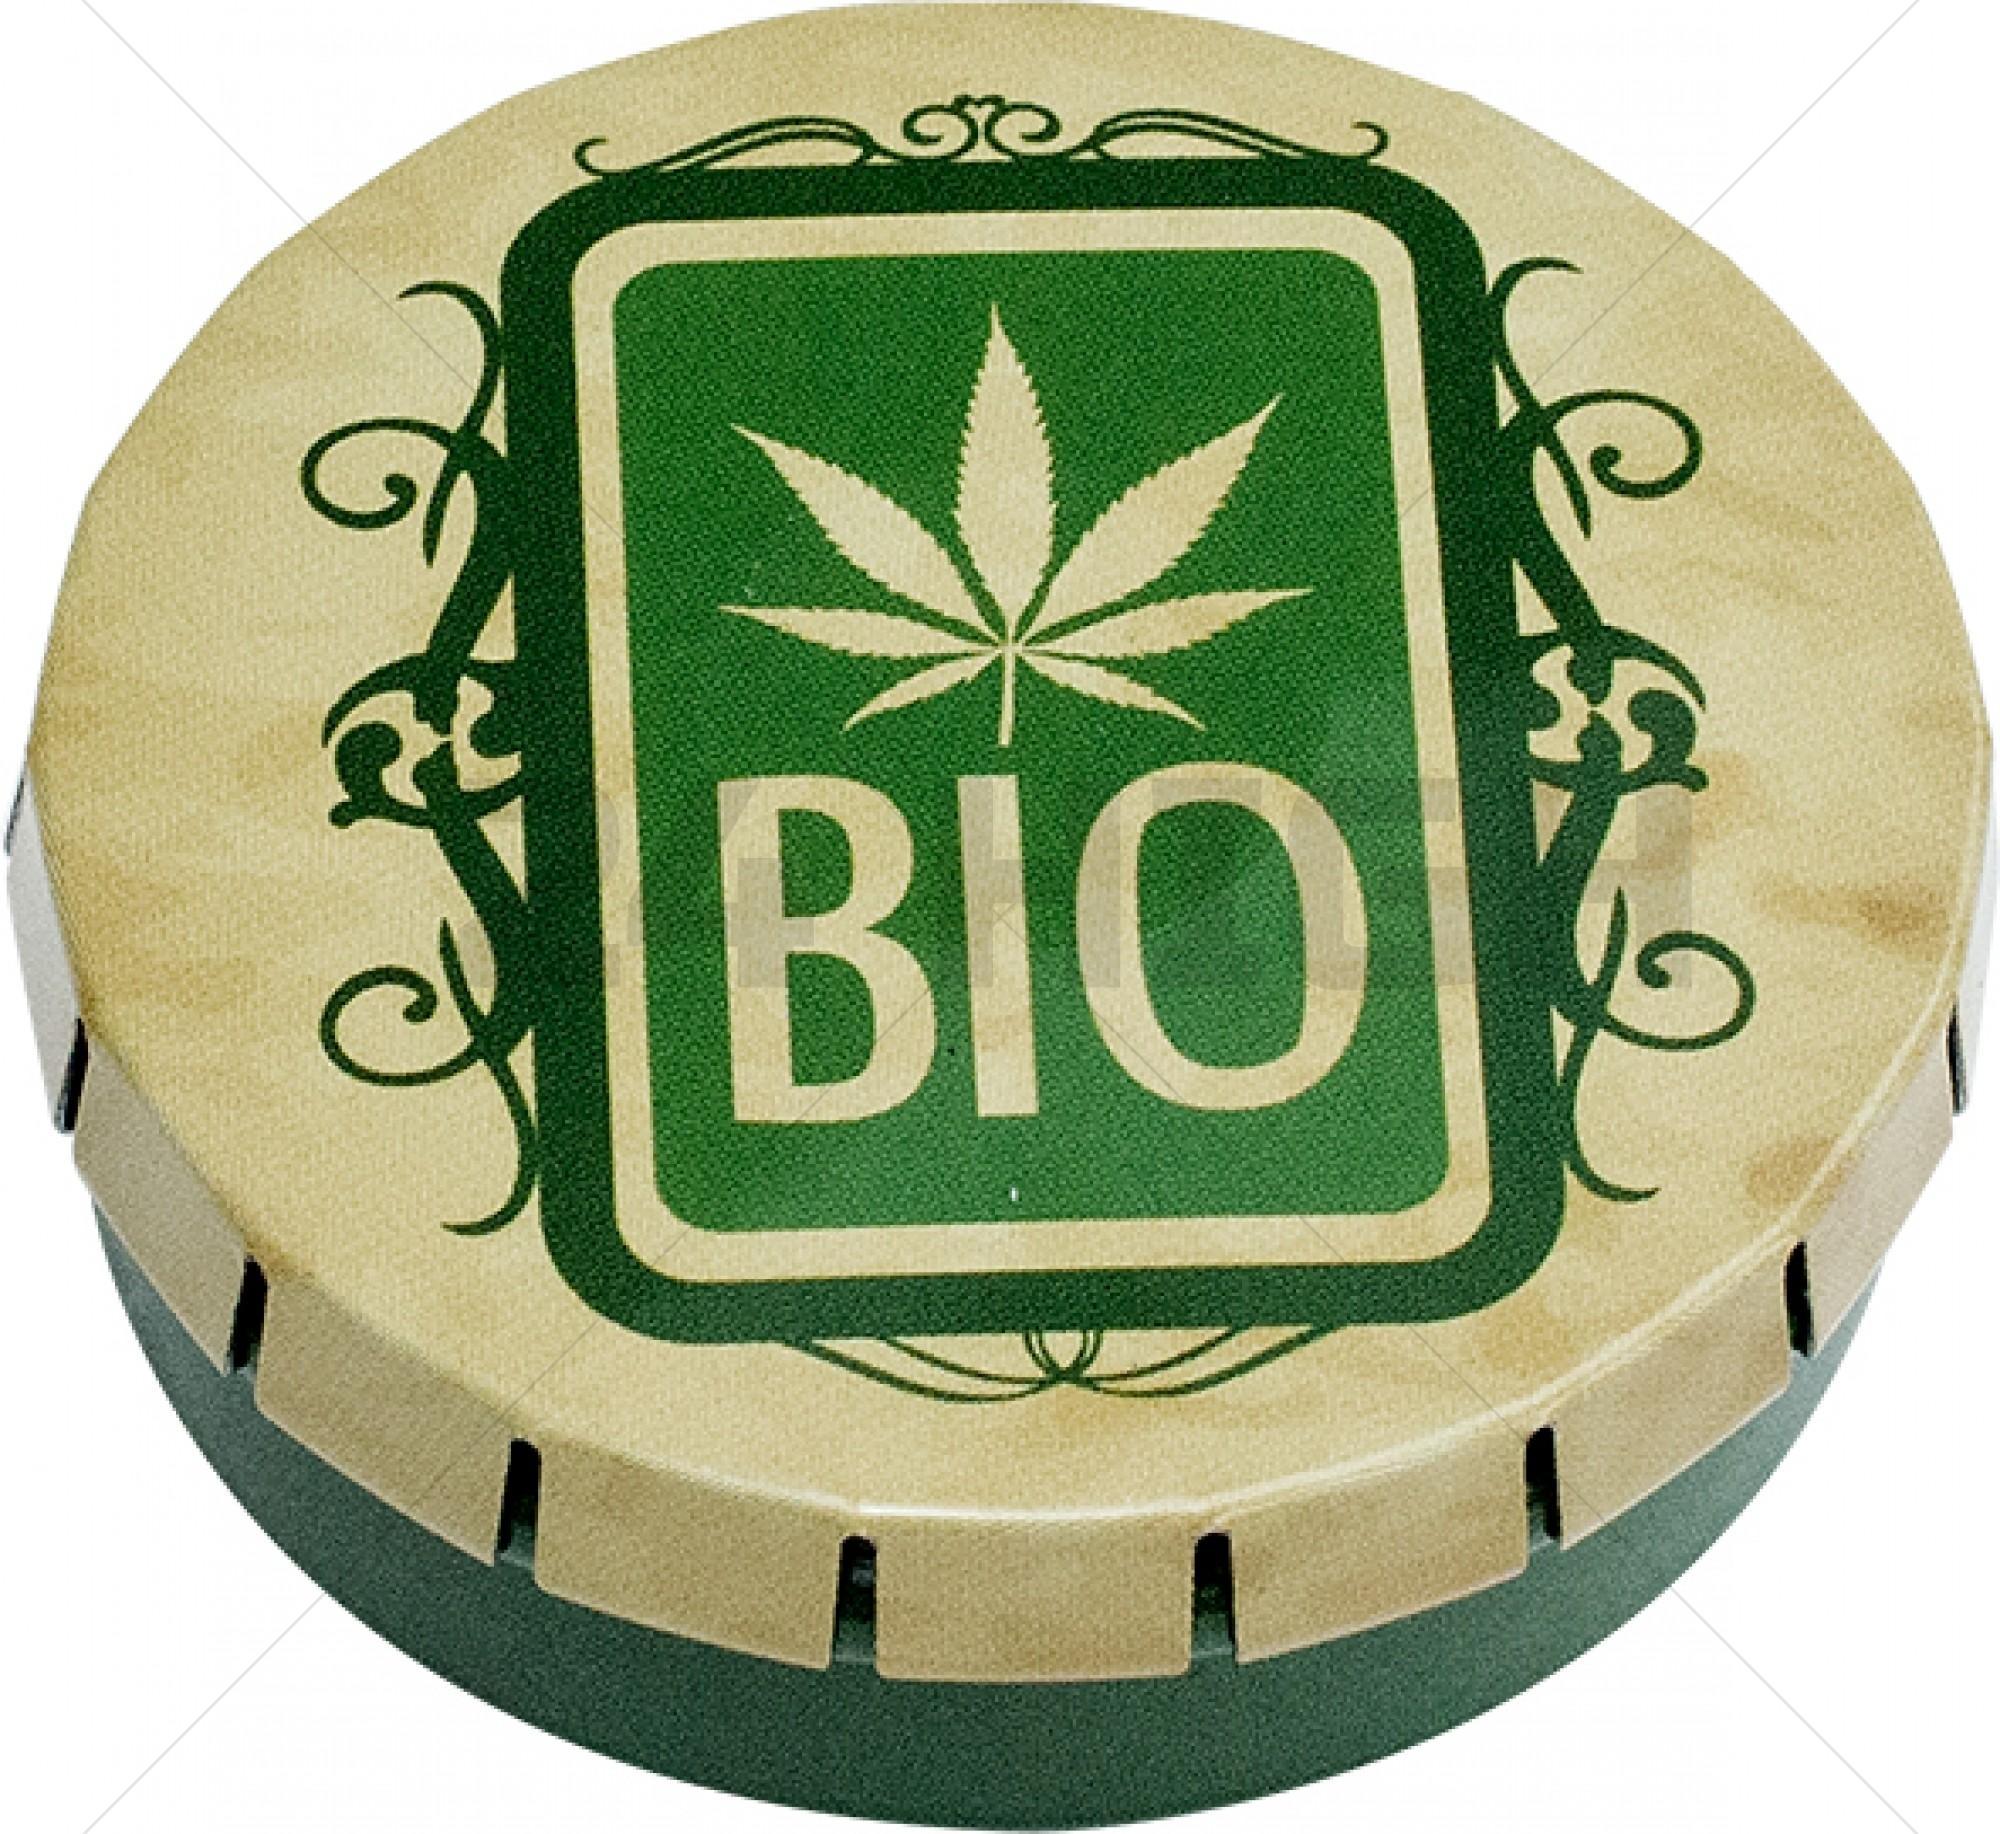 Click-Clack Box (Ø 5,5 cm) Organic Product - BIo